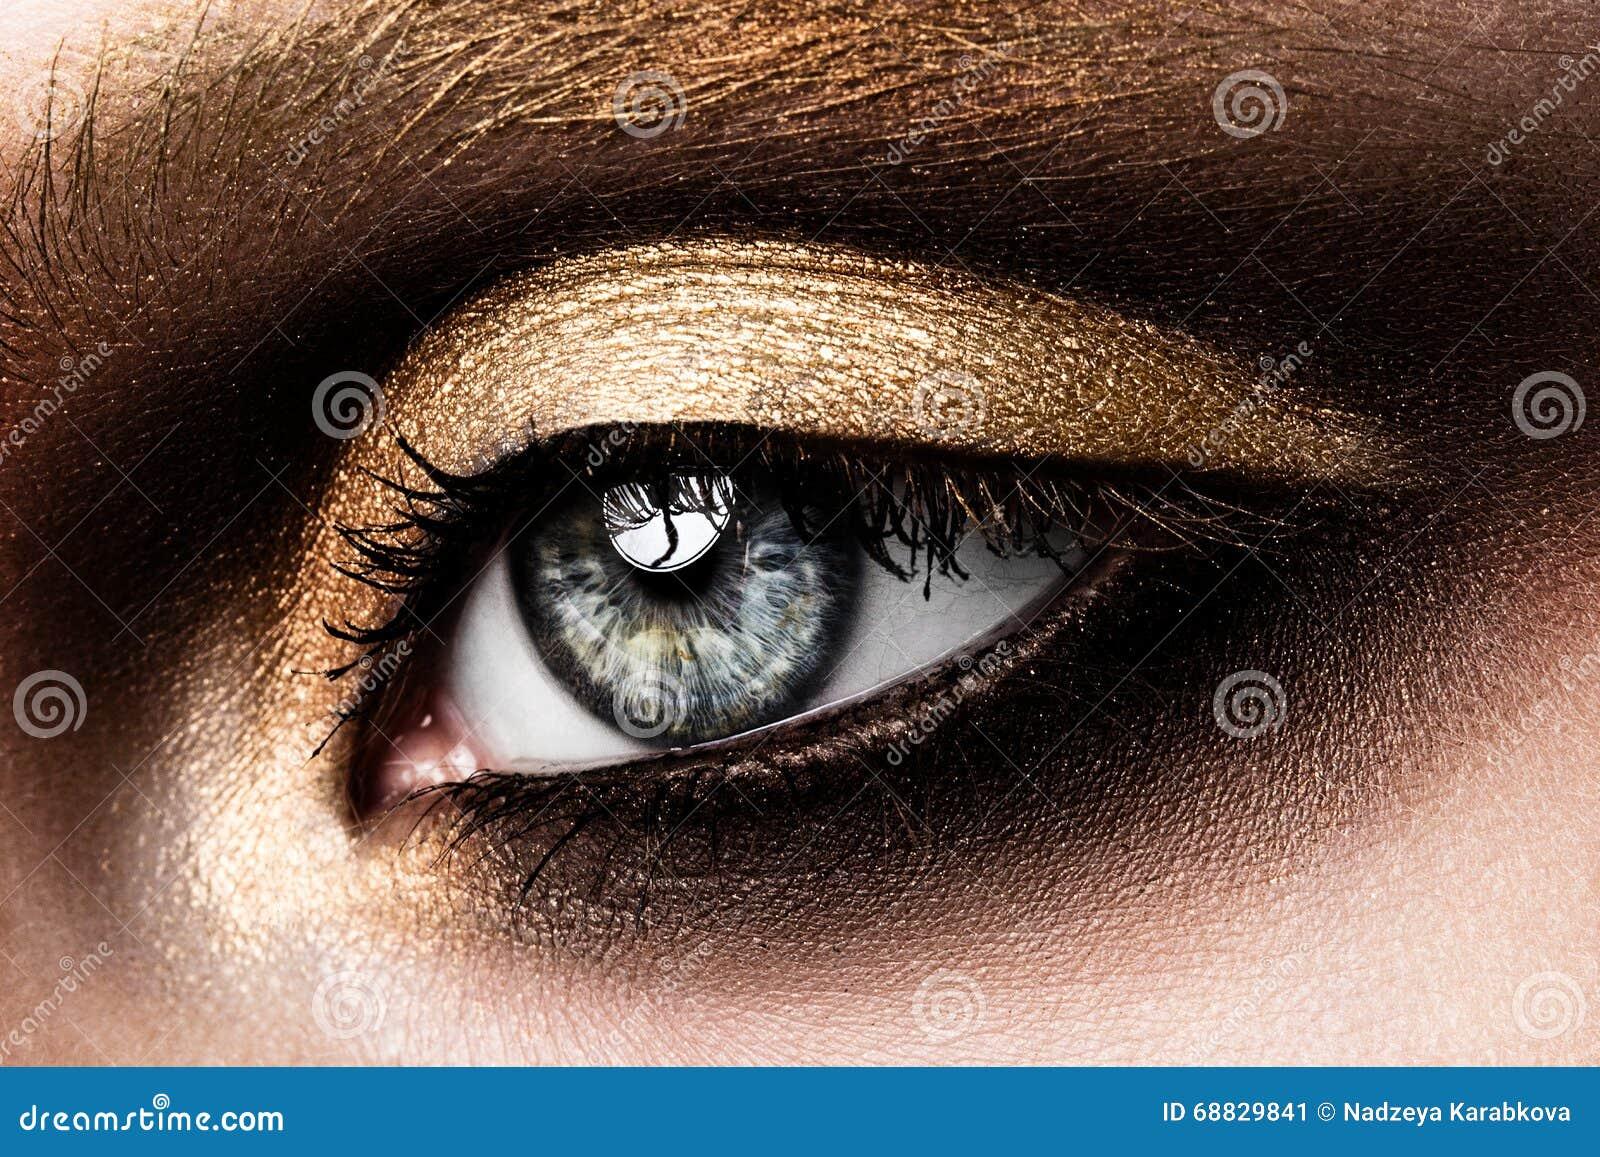 Nahaufnahme des schönen womanish Auges